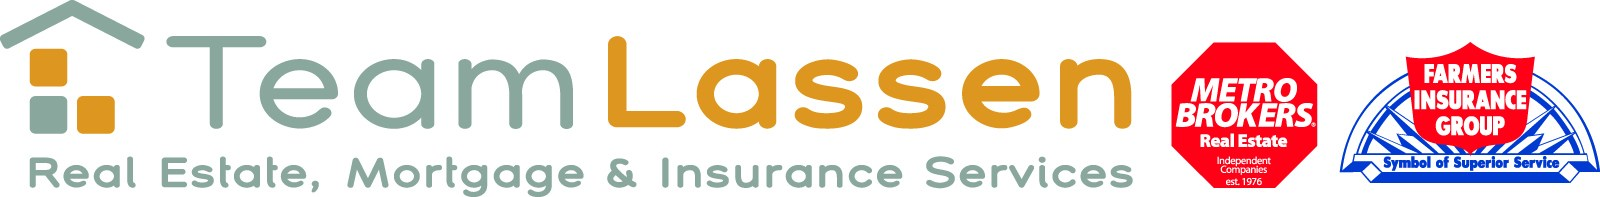 Team Lassen - Metro Brokers Logo